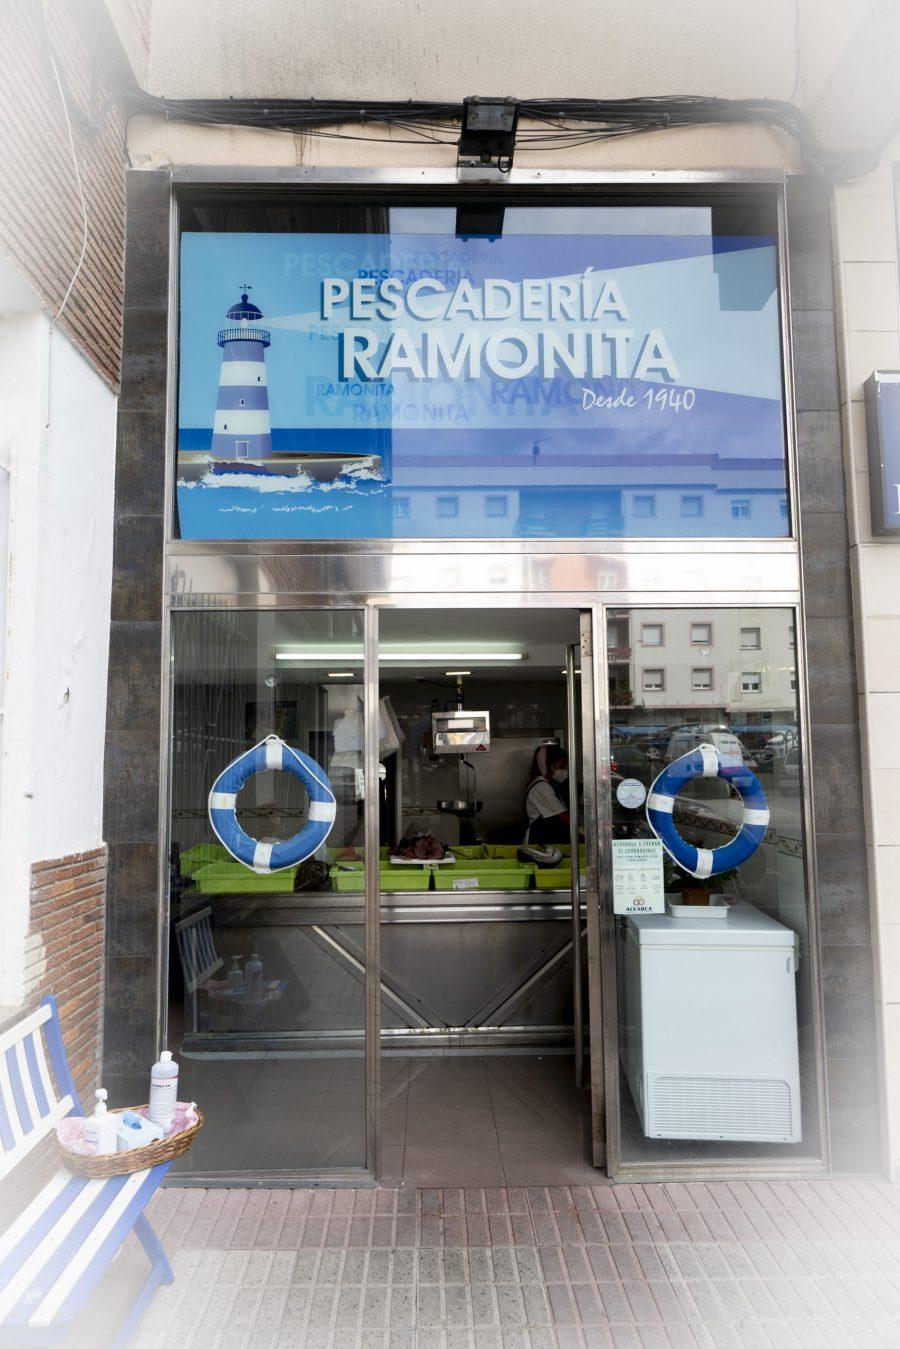 Pescadería Ramonita